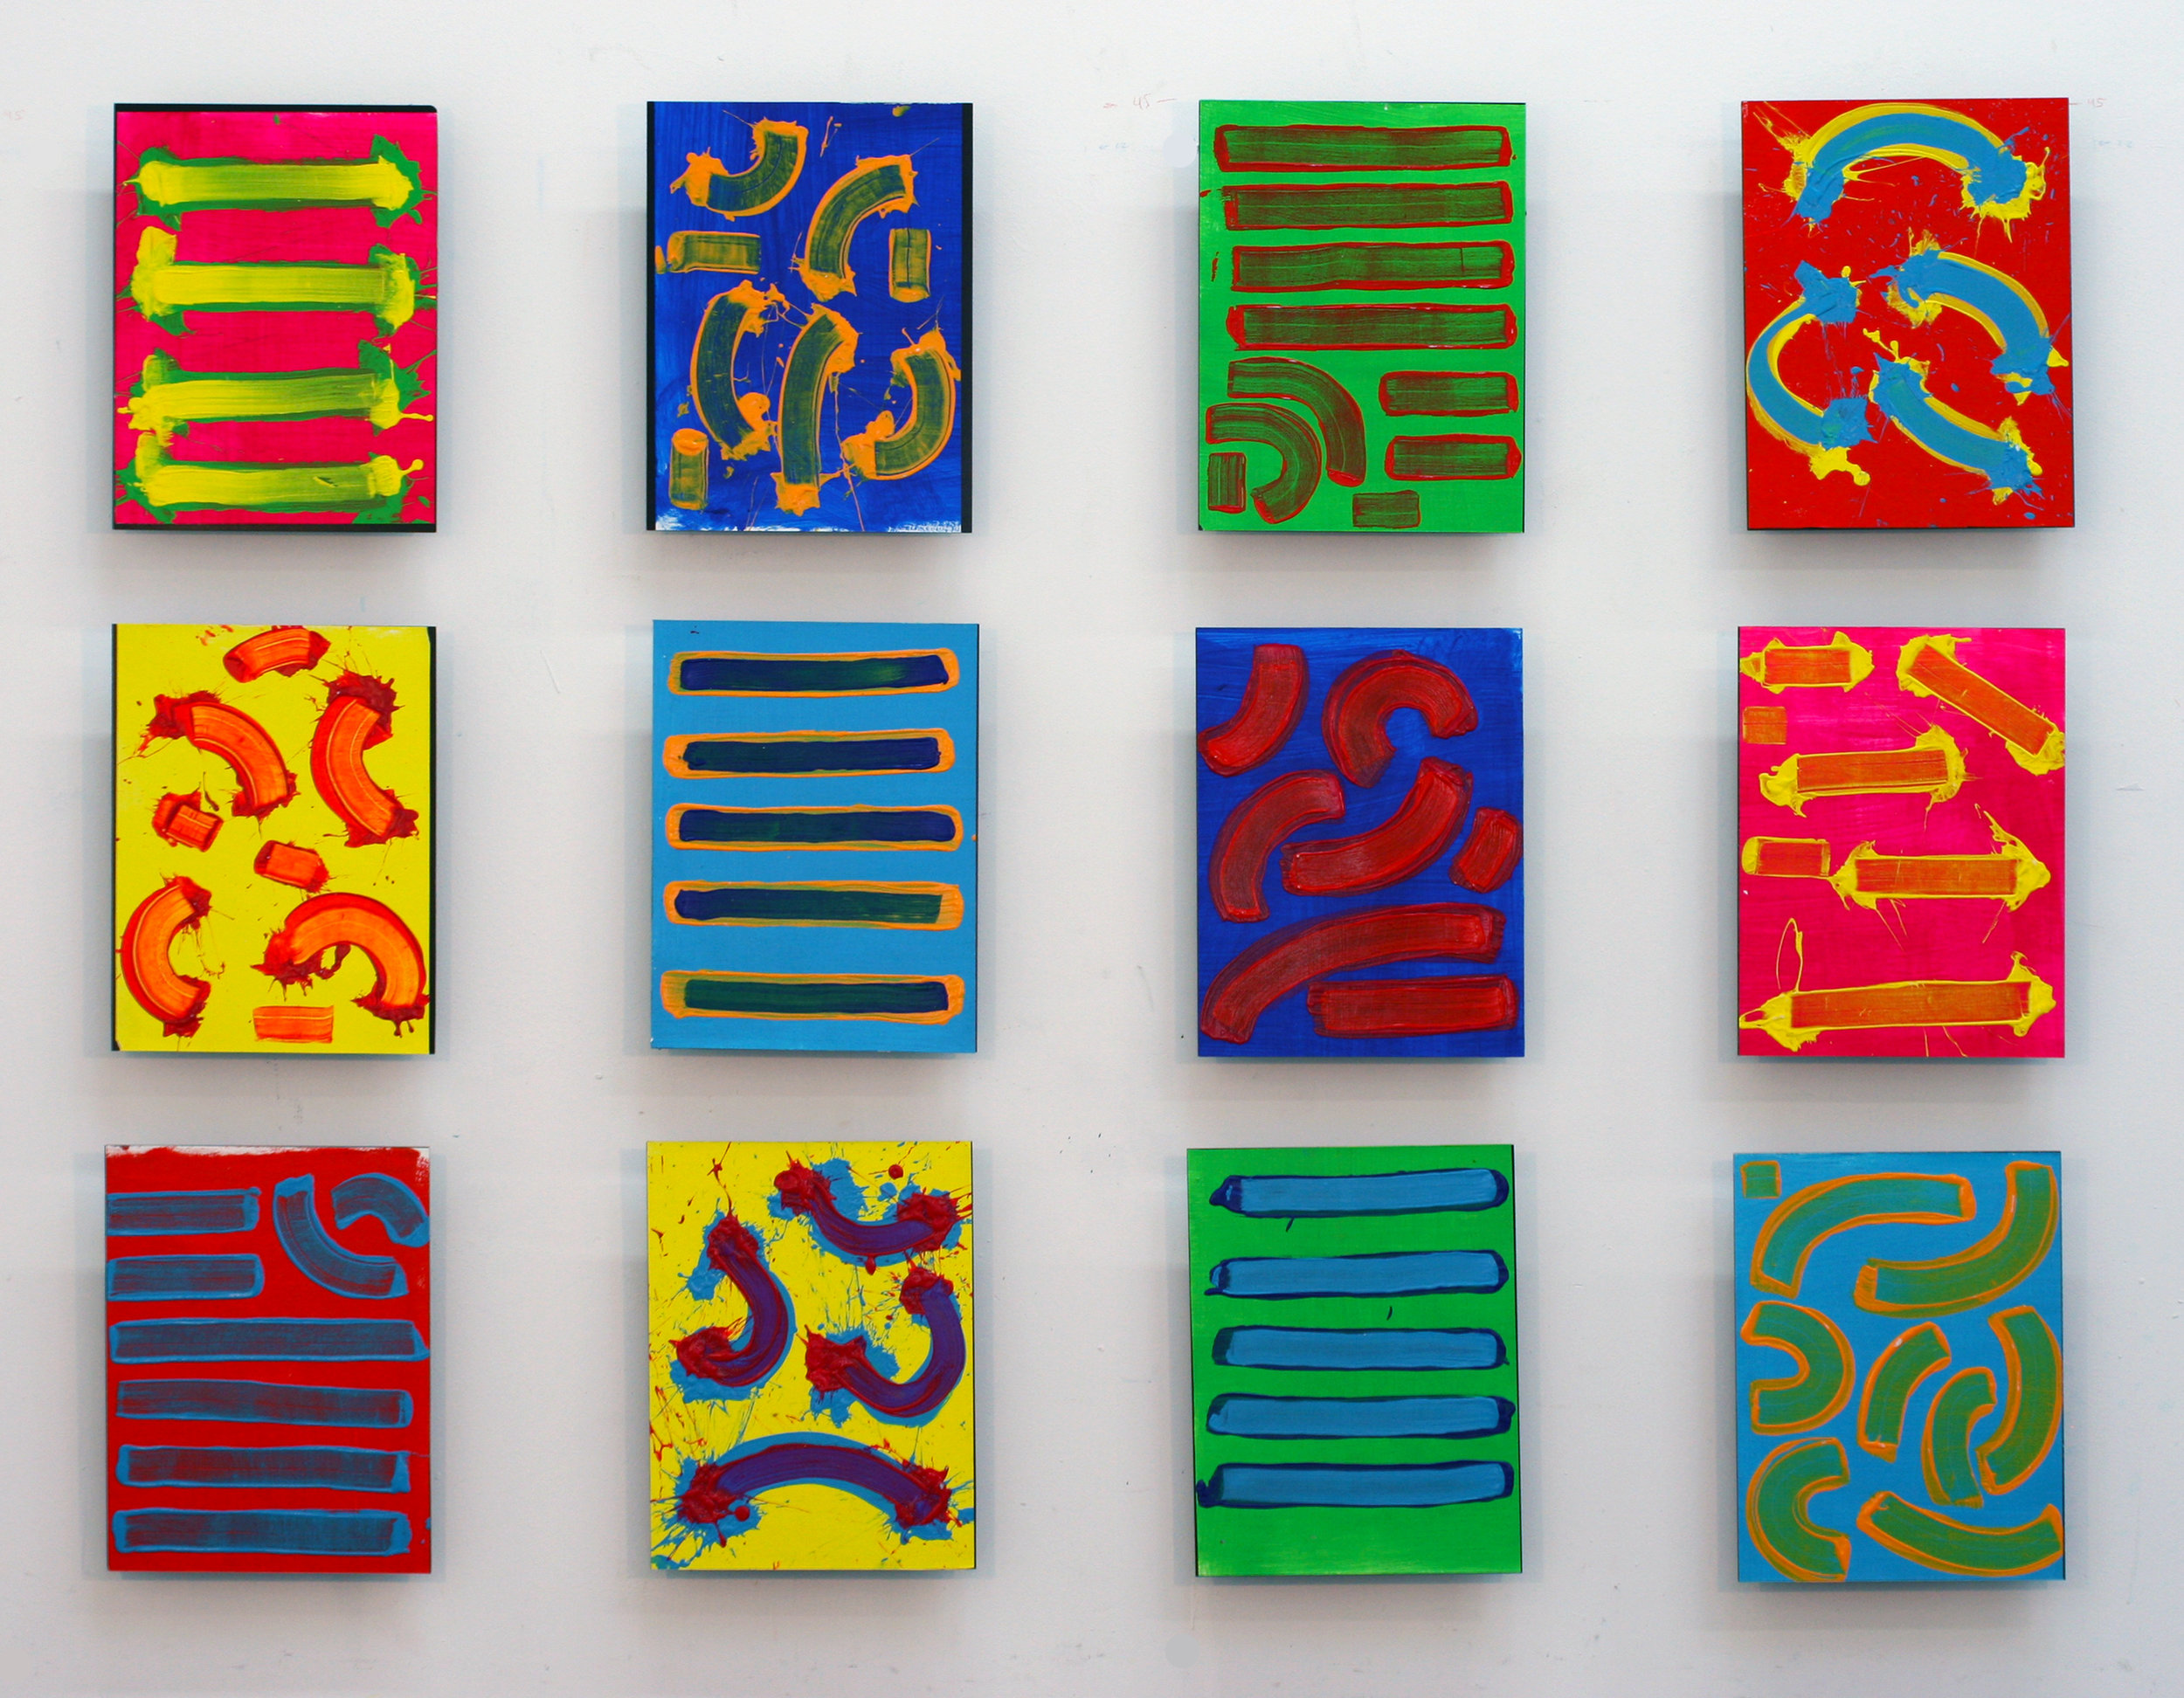 MattSheridan_StillSystemicSequence003_PaintingsOnPaper_12x9_each(setof12images)_2012_$900.jpg